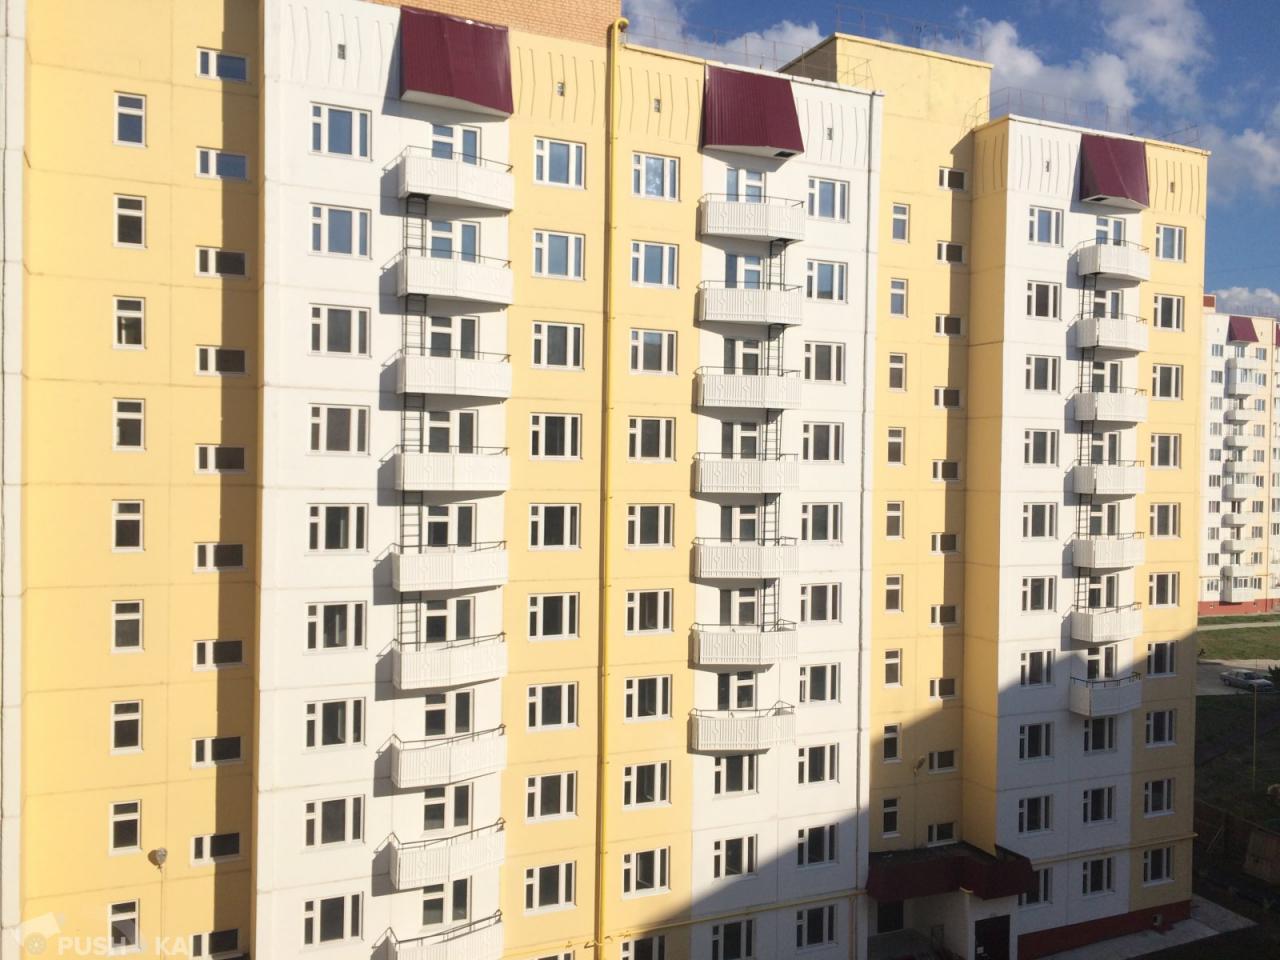 Продаётся 2-комнатная квартира 61.0 кв.м. этаж 7/10 за 3 000 000 руб